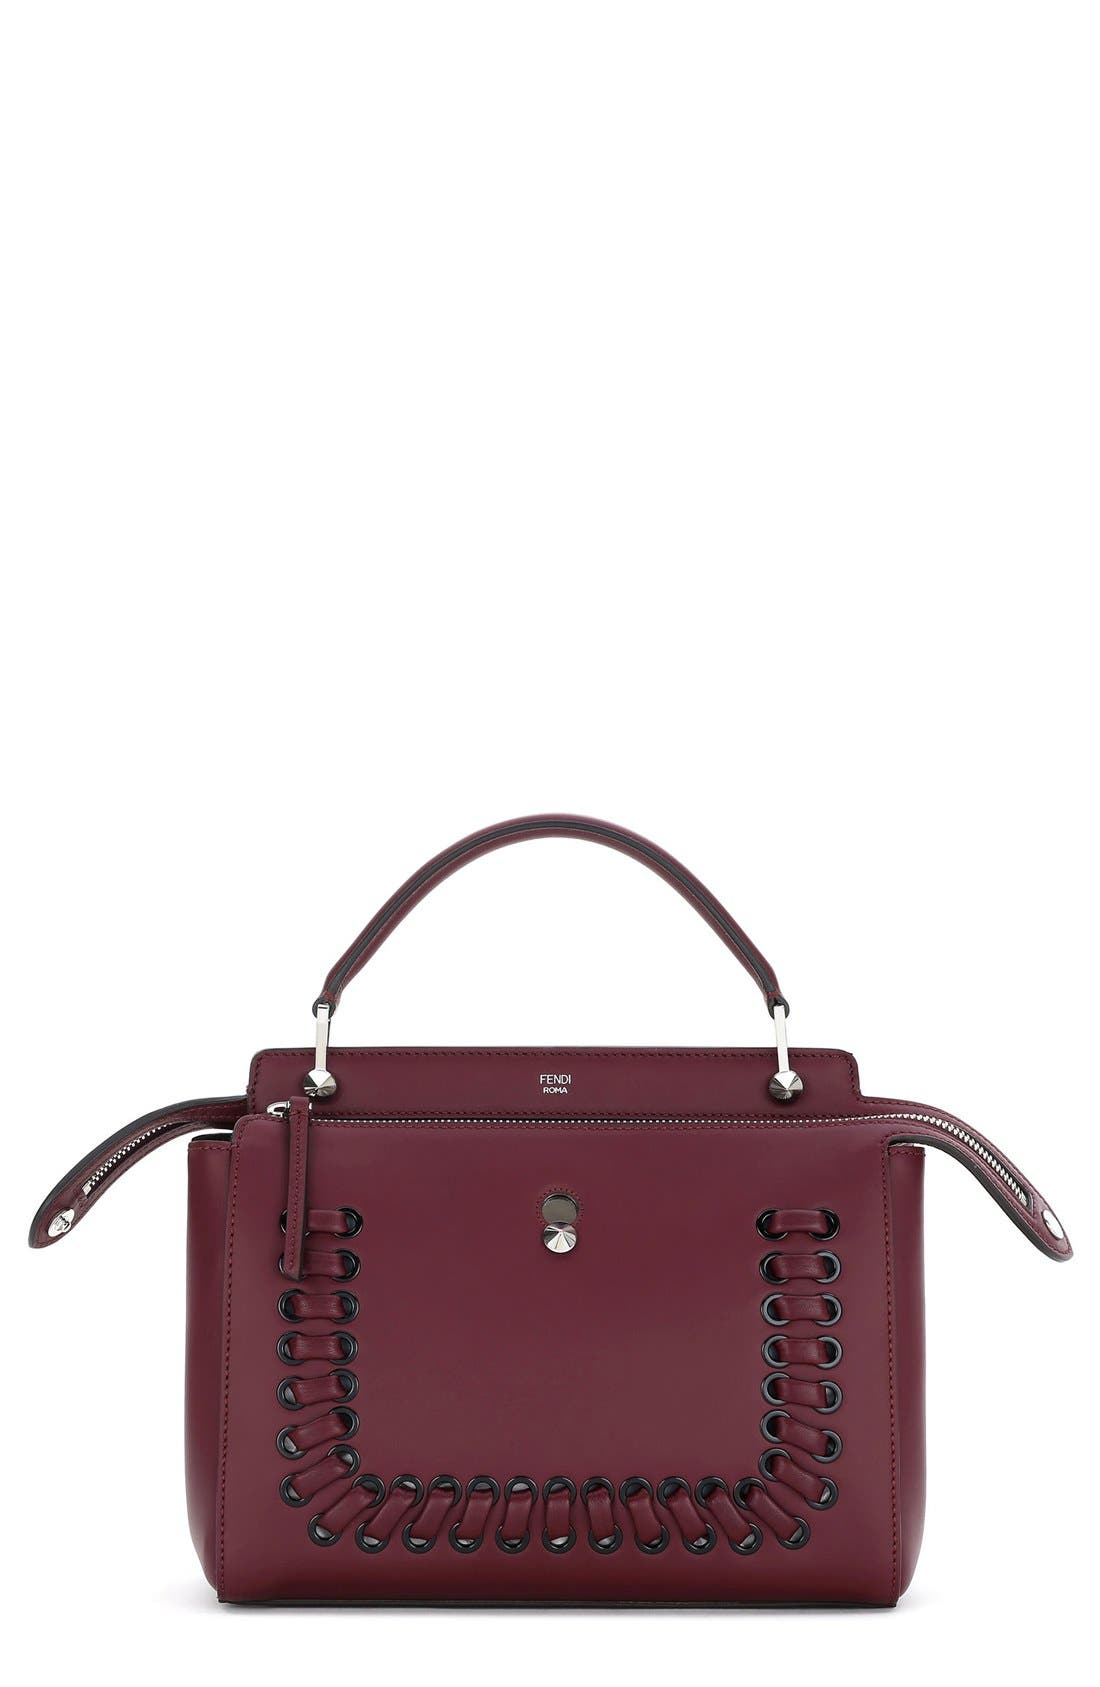 FENDI 'DOTCOM' Lace-Up Leather Satchel